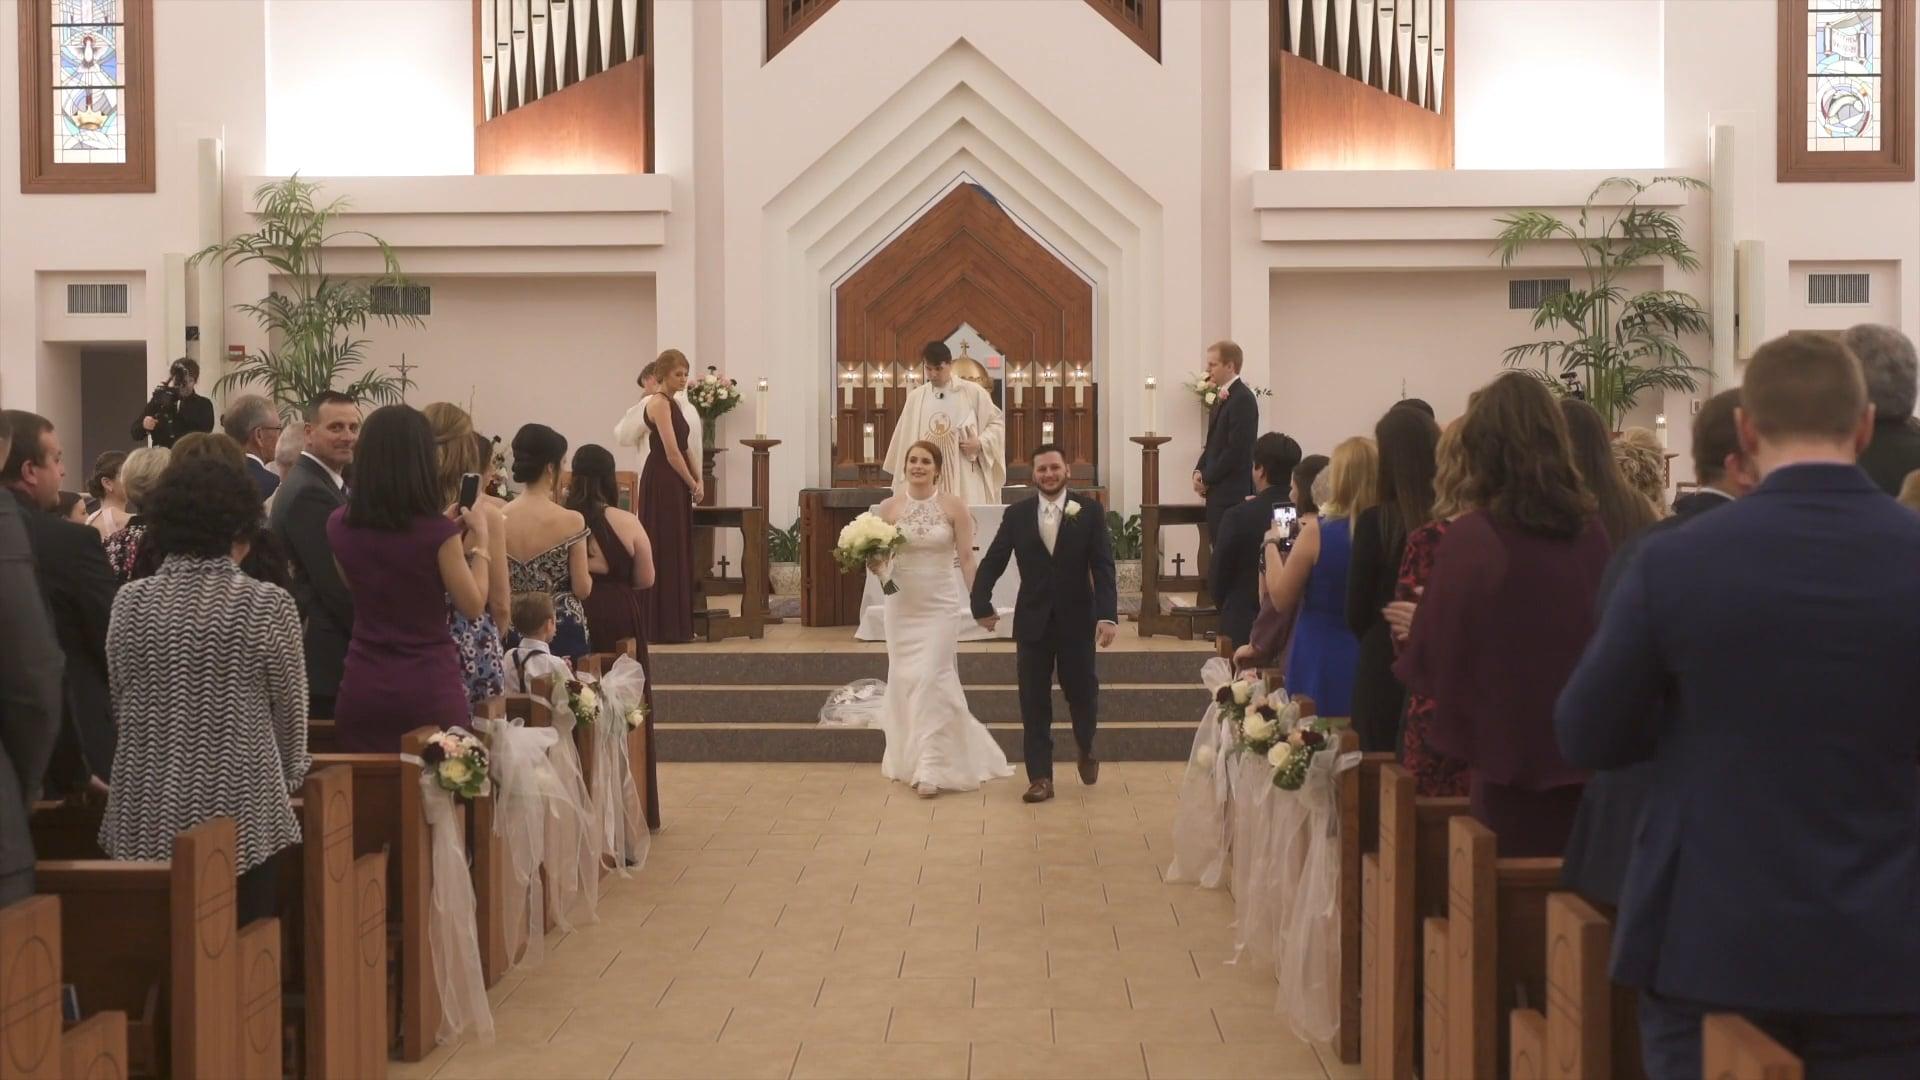 Taylor & Blake | Full Ceremony & Reception